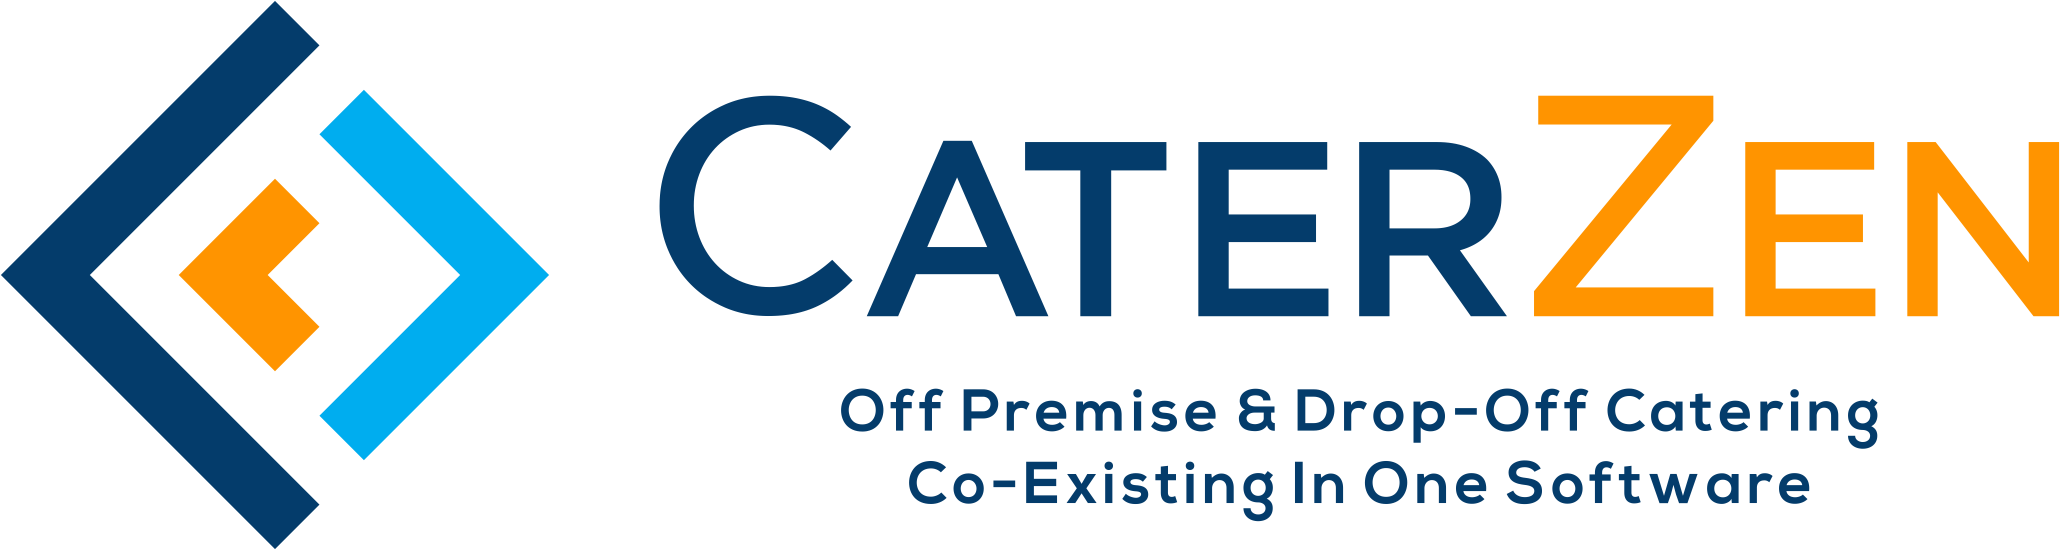 caterzen-logo-full